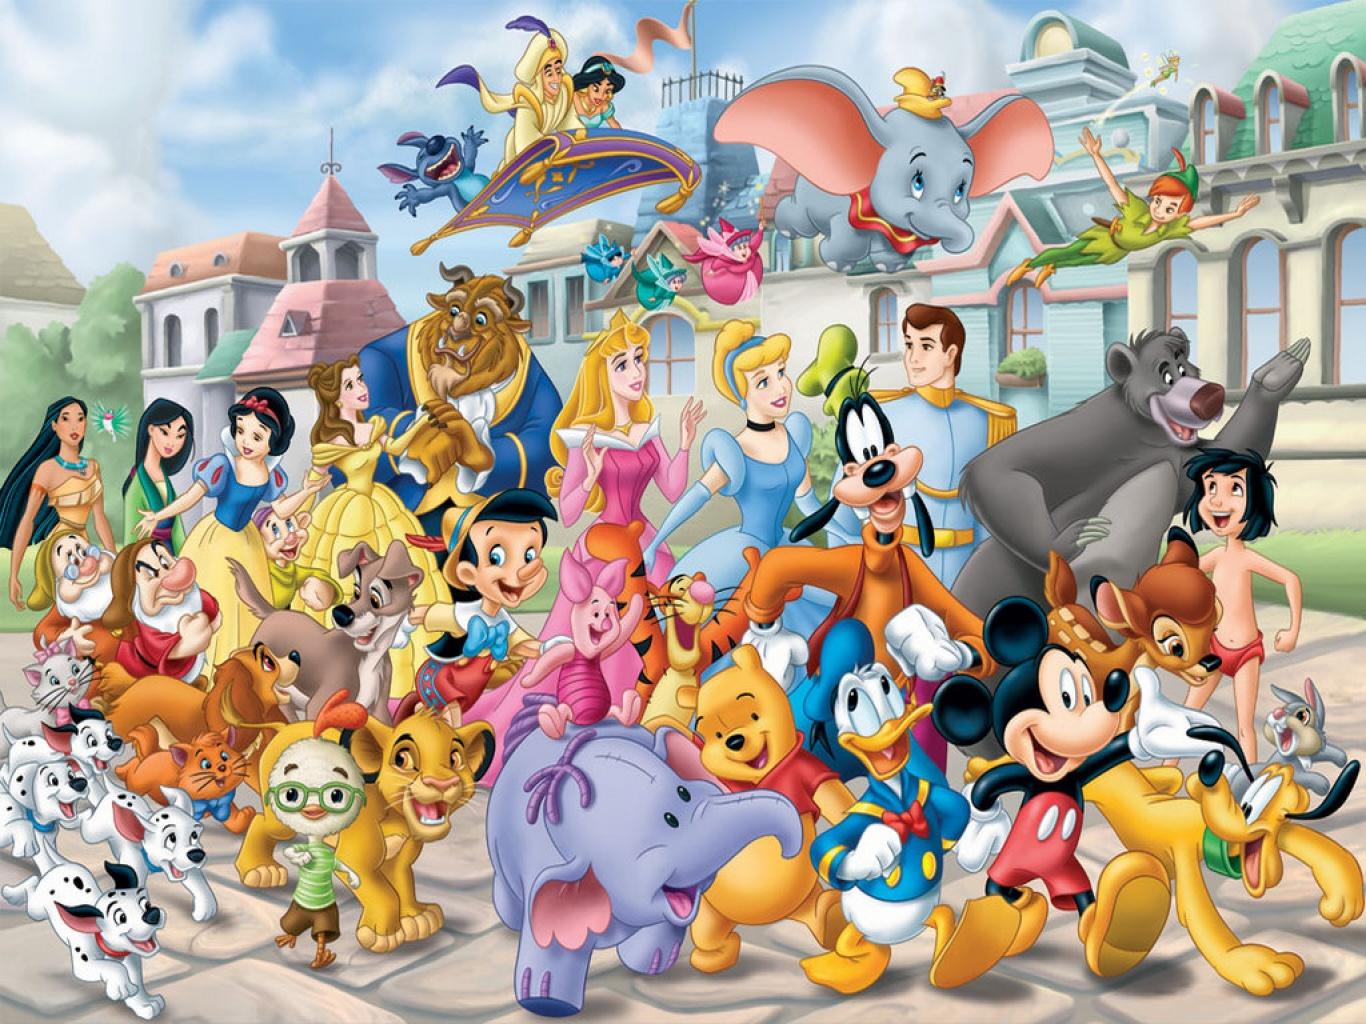 wallpapers wallpaper download many disney characters disney 1366x1024